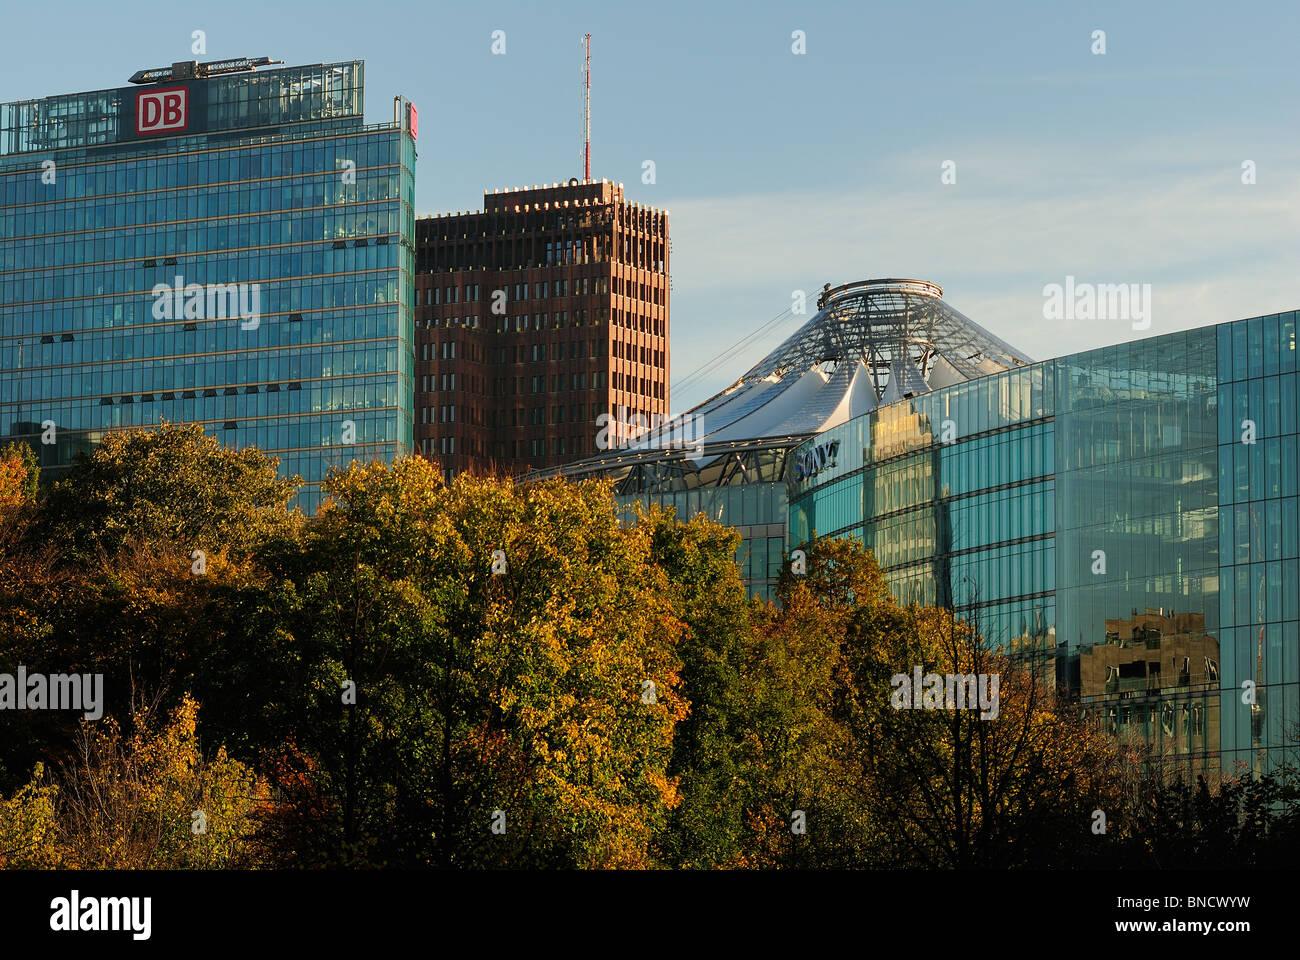 Potsdamer Platz. Skyline seen from the Grosser Tiergarten park, with DB Tower, Kollhoff building, Sony Center, Berlin, - Stock Image